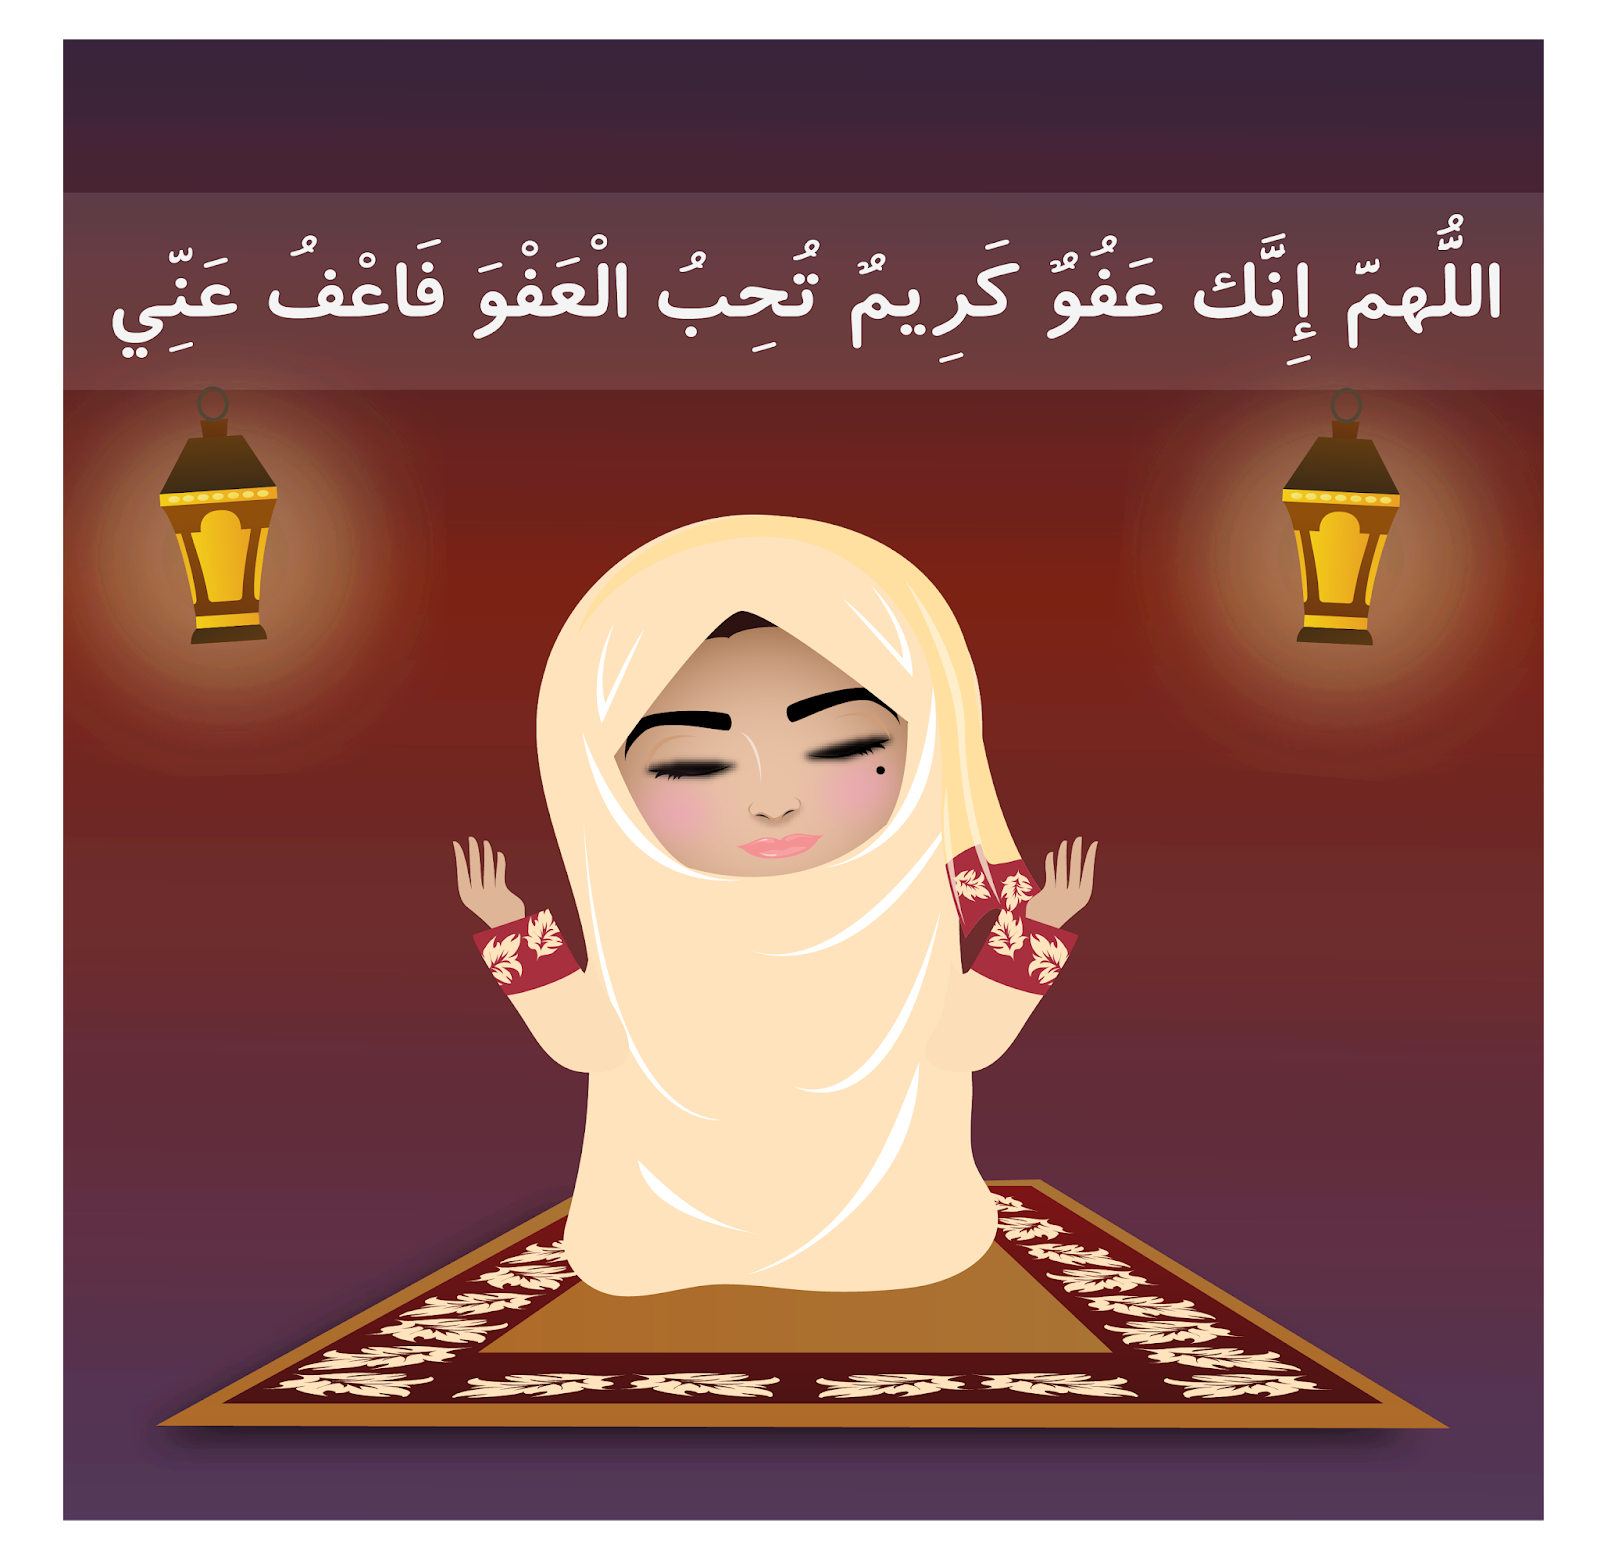 حالات واتس تهنئة بشهر رمضان 510072_dreambox-sat.